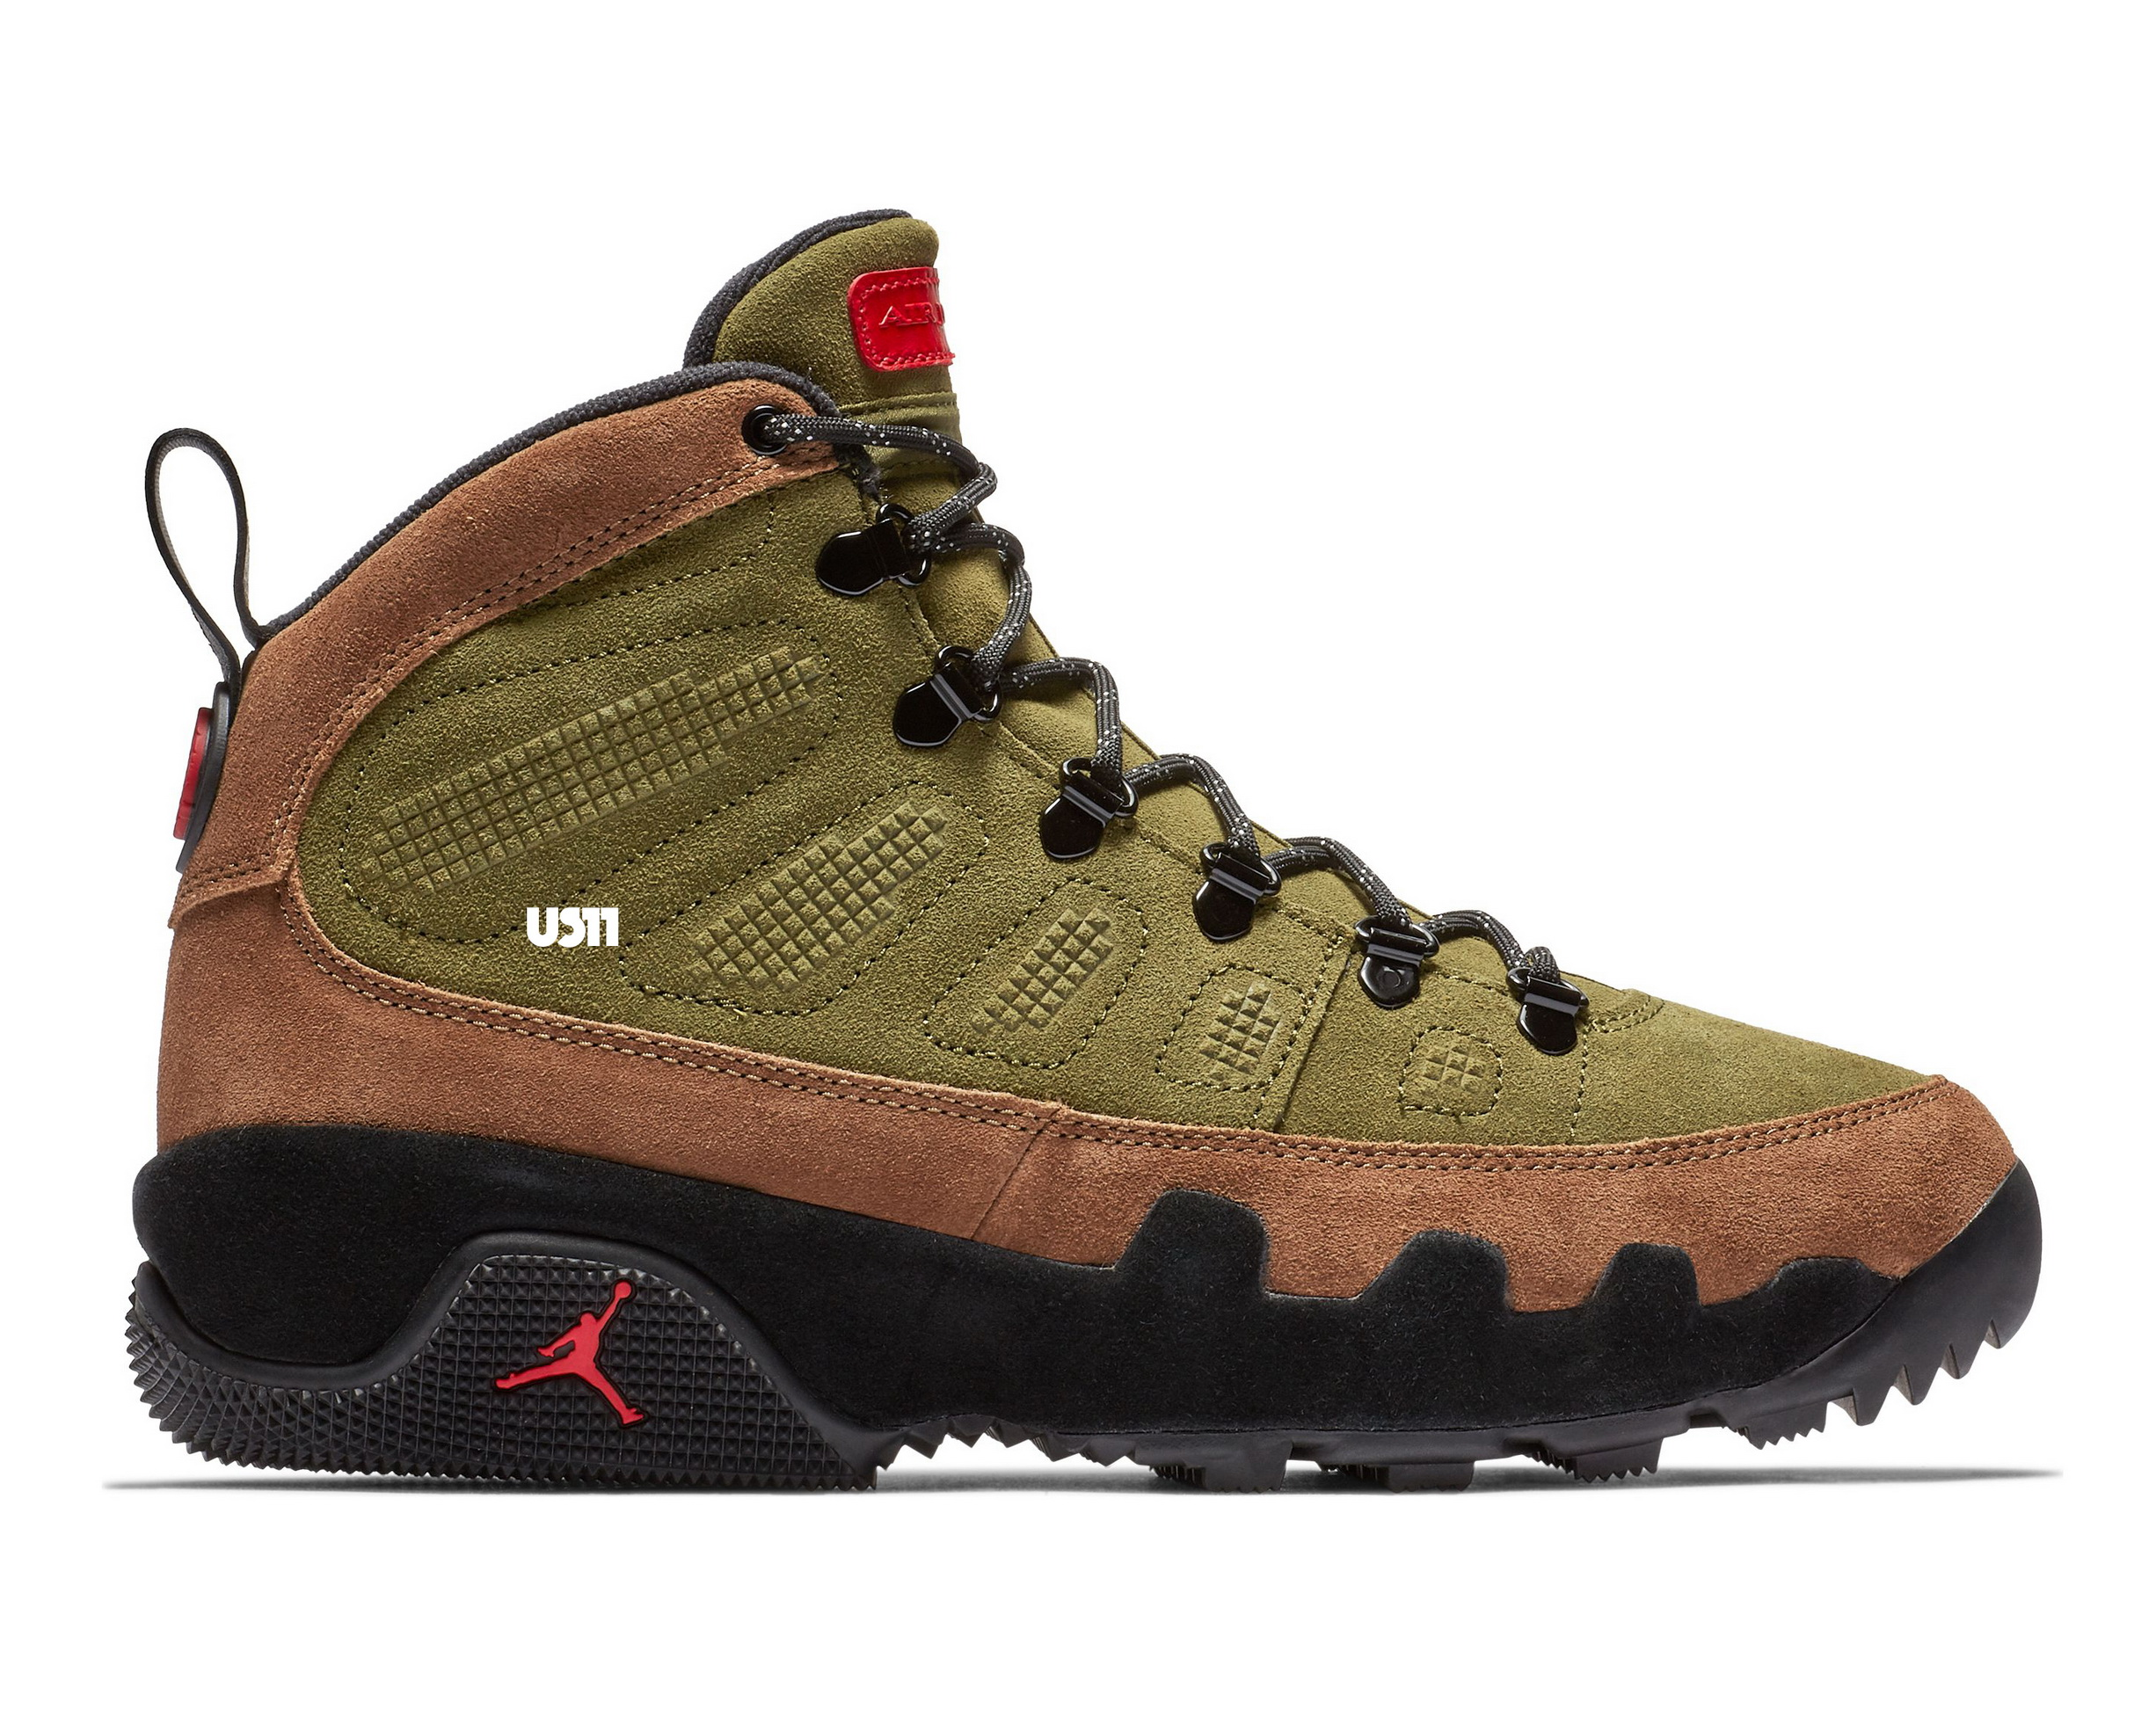 6f69fad2ed41db reduced air jordan 9 boot nrg olive release date 93c4d d6bc6